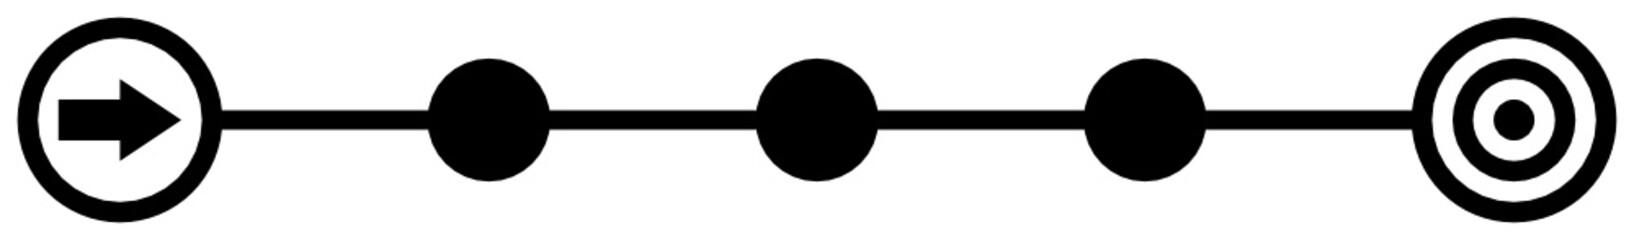 Start - Zwischenziele - Ziel Fotomurales